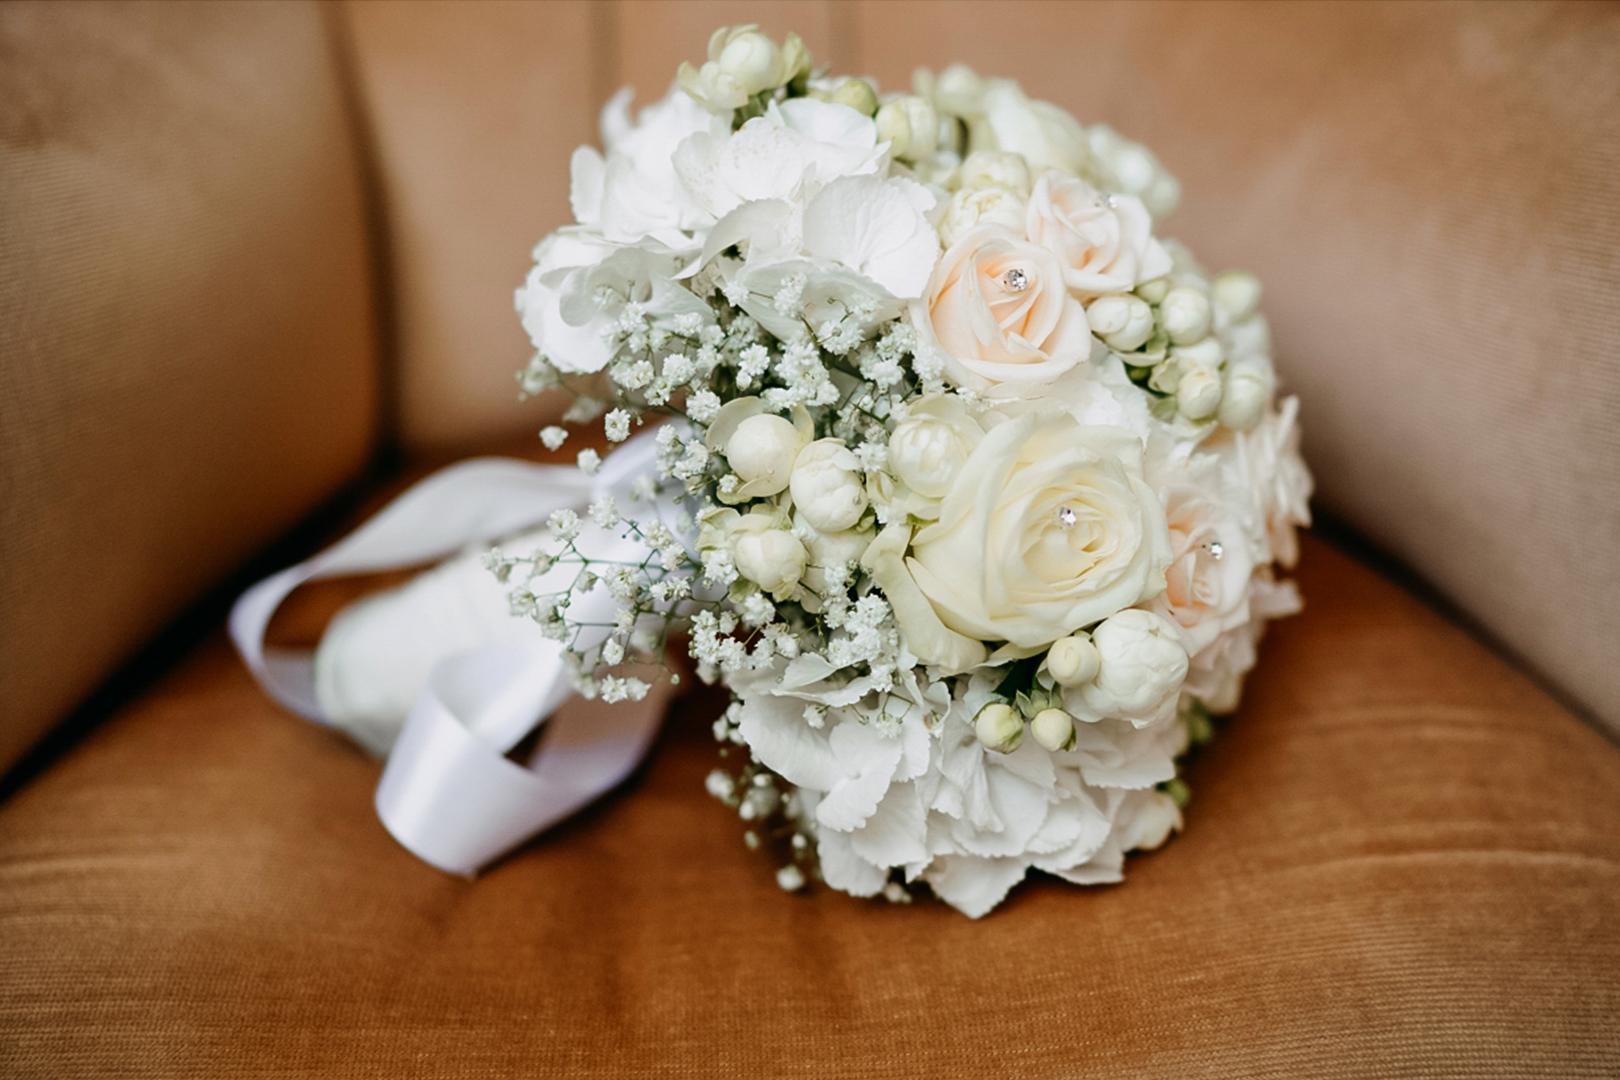 8 gianni-lepore-bouquet-sposa